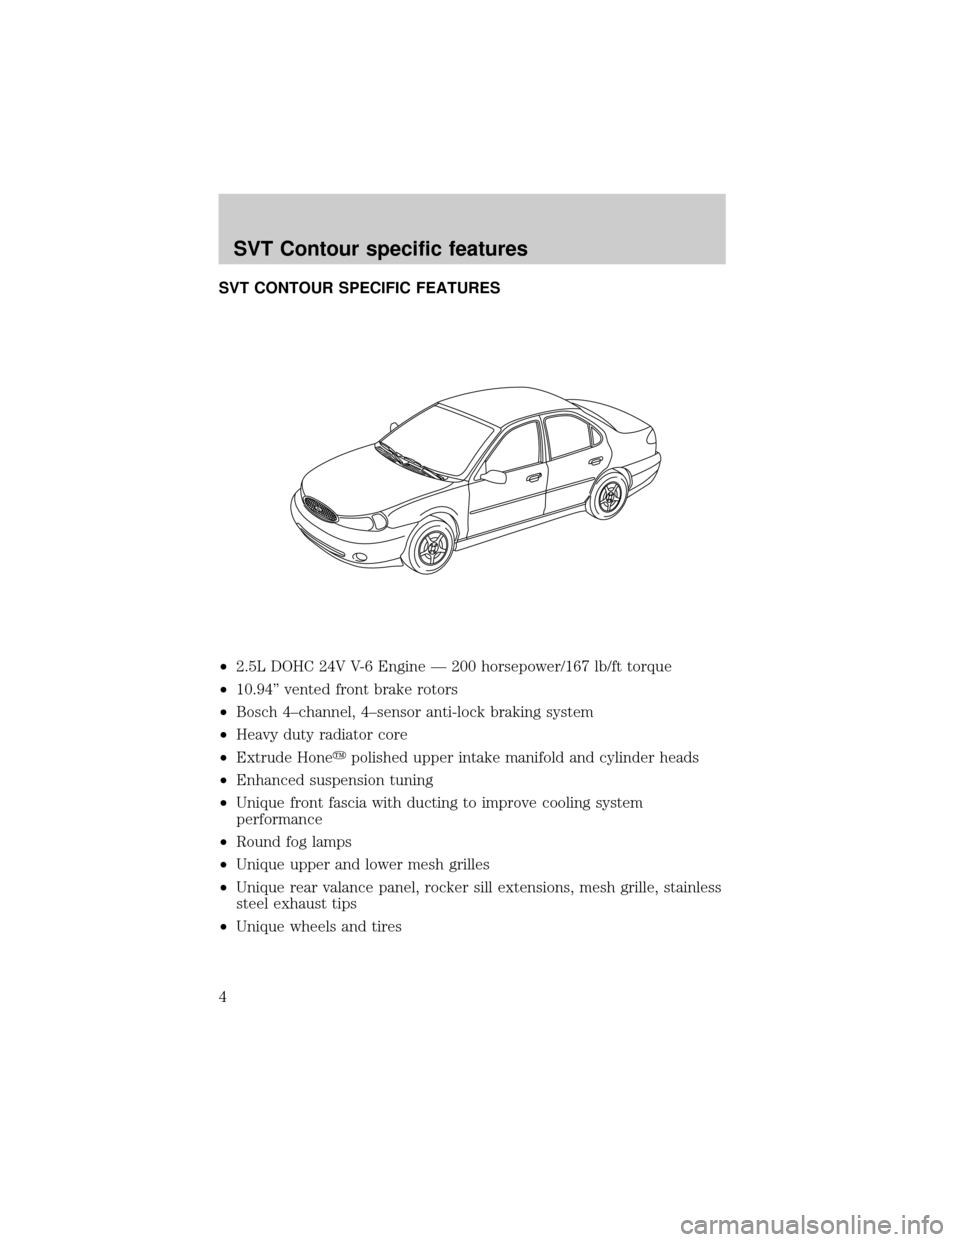 Ford Contour 2000 2g Svt Supplement Manual 2 0 Engine Diagram